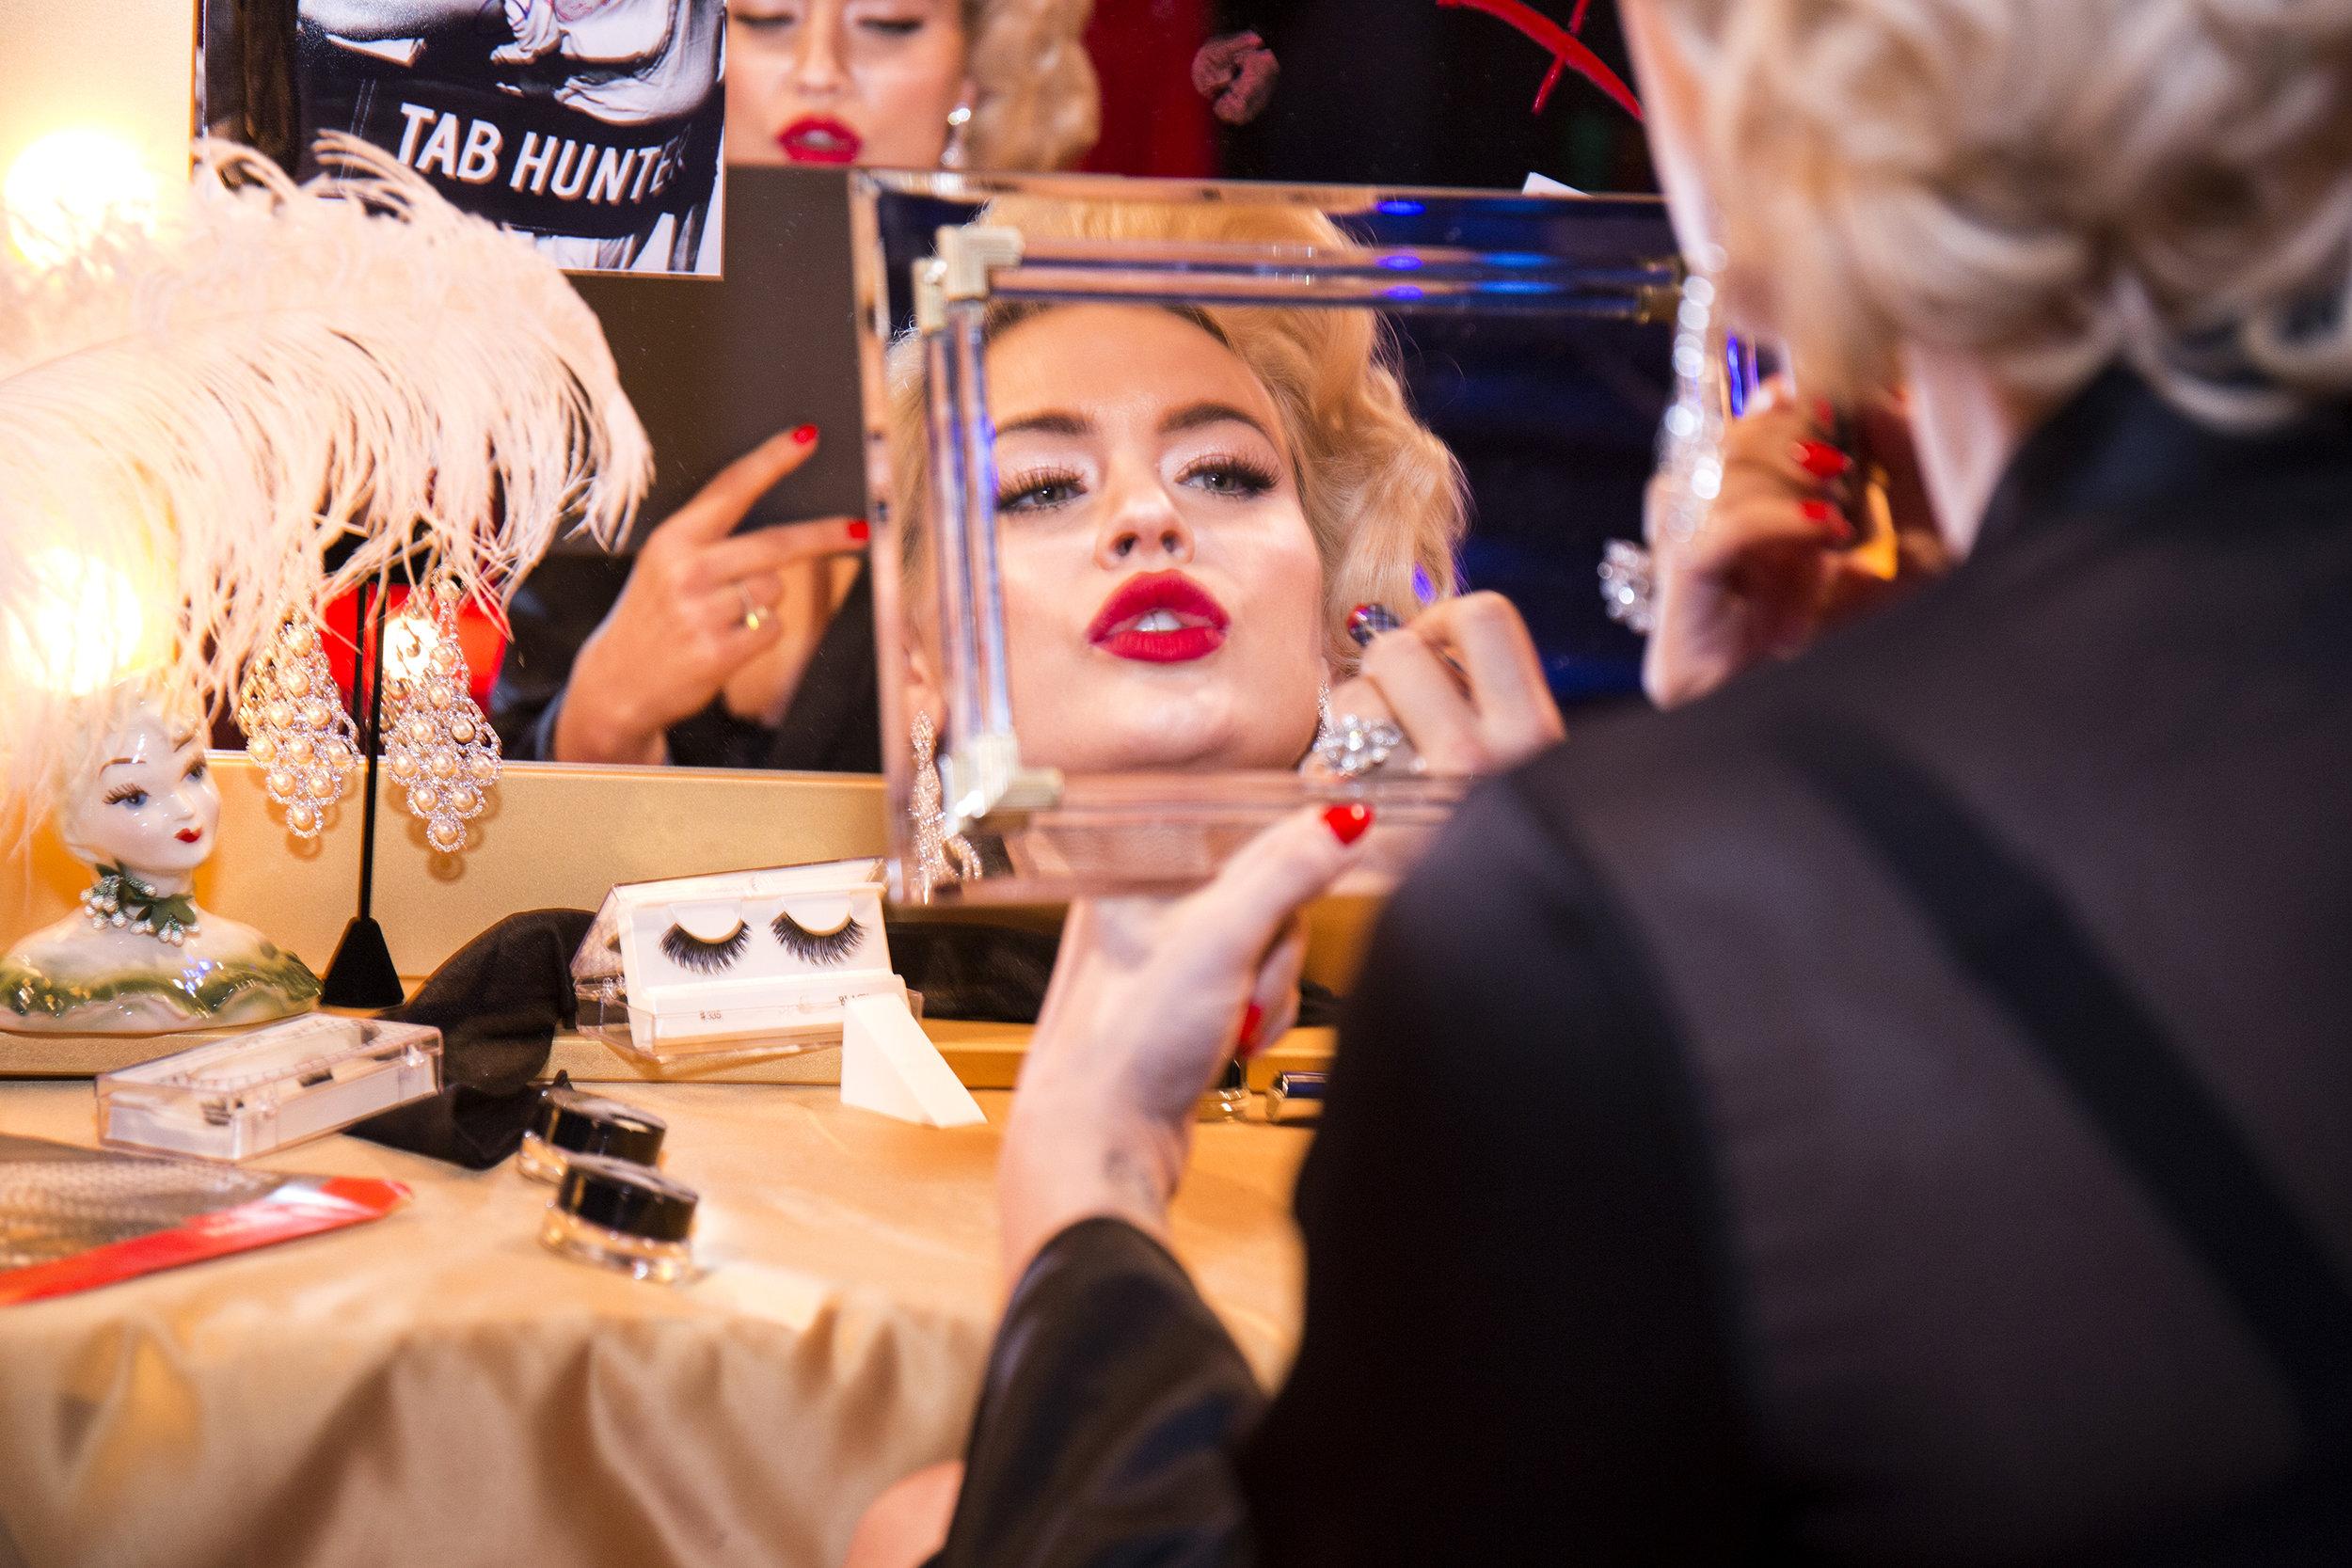 ALCONE Showgirl in mirror Photo Santiago Felipe.jpg